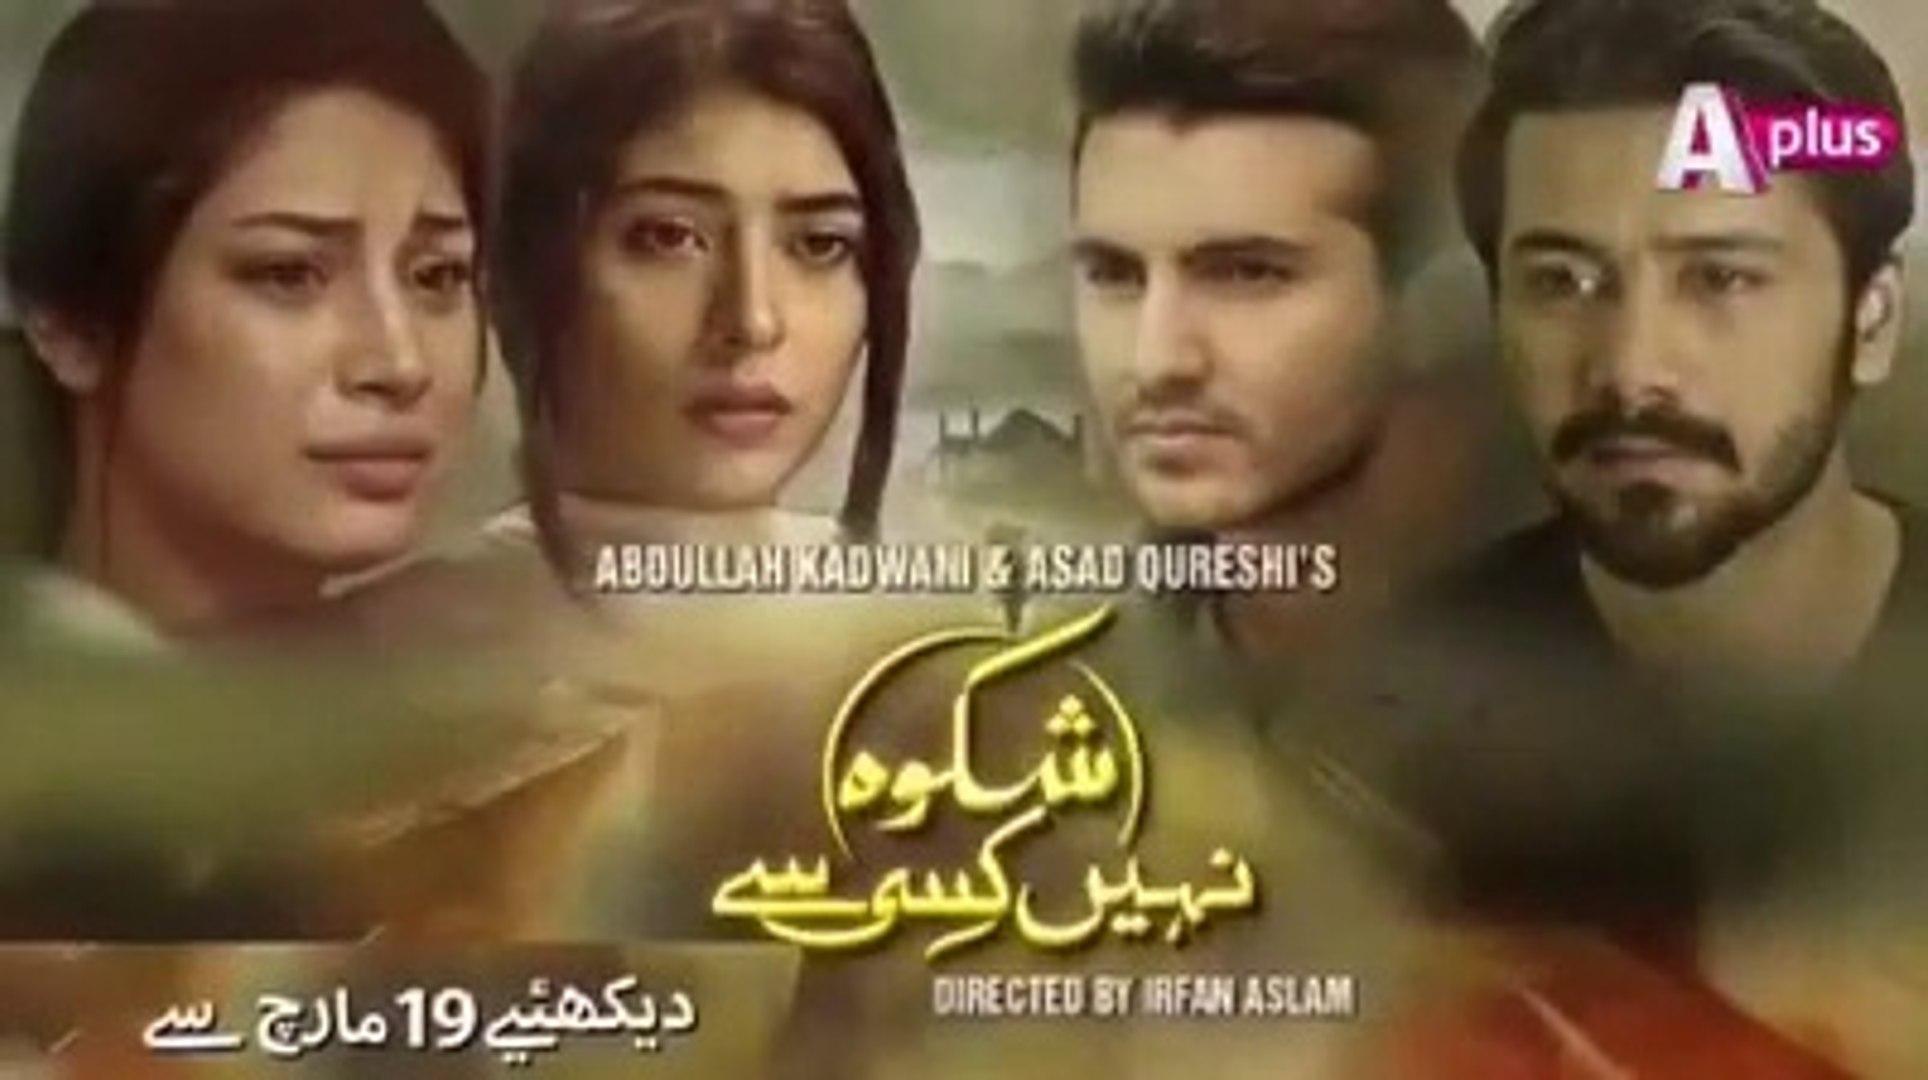 Shikwa Nahi Kisi Se Ost Pakistani Drama Sahir Ali Bagga Afshan Fawad